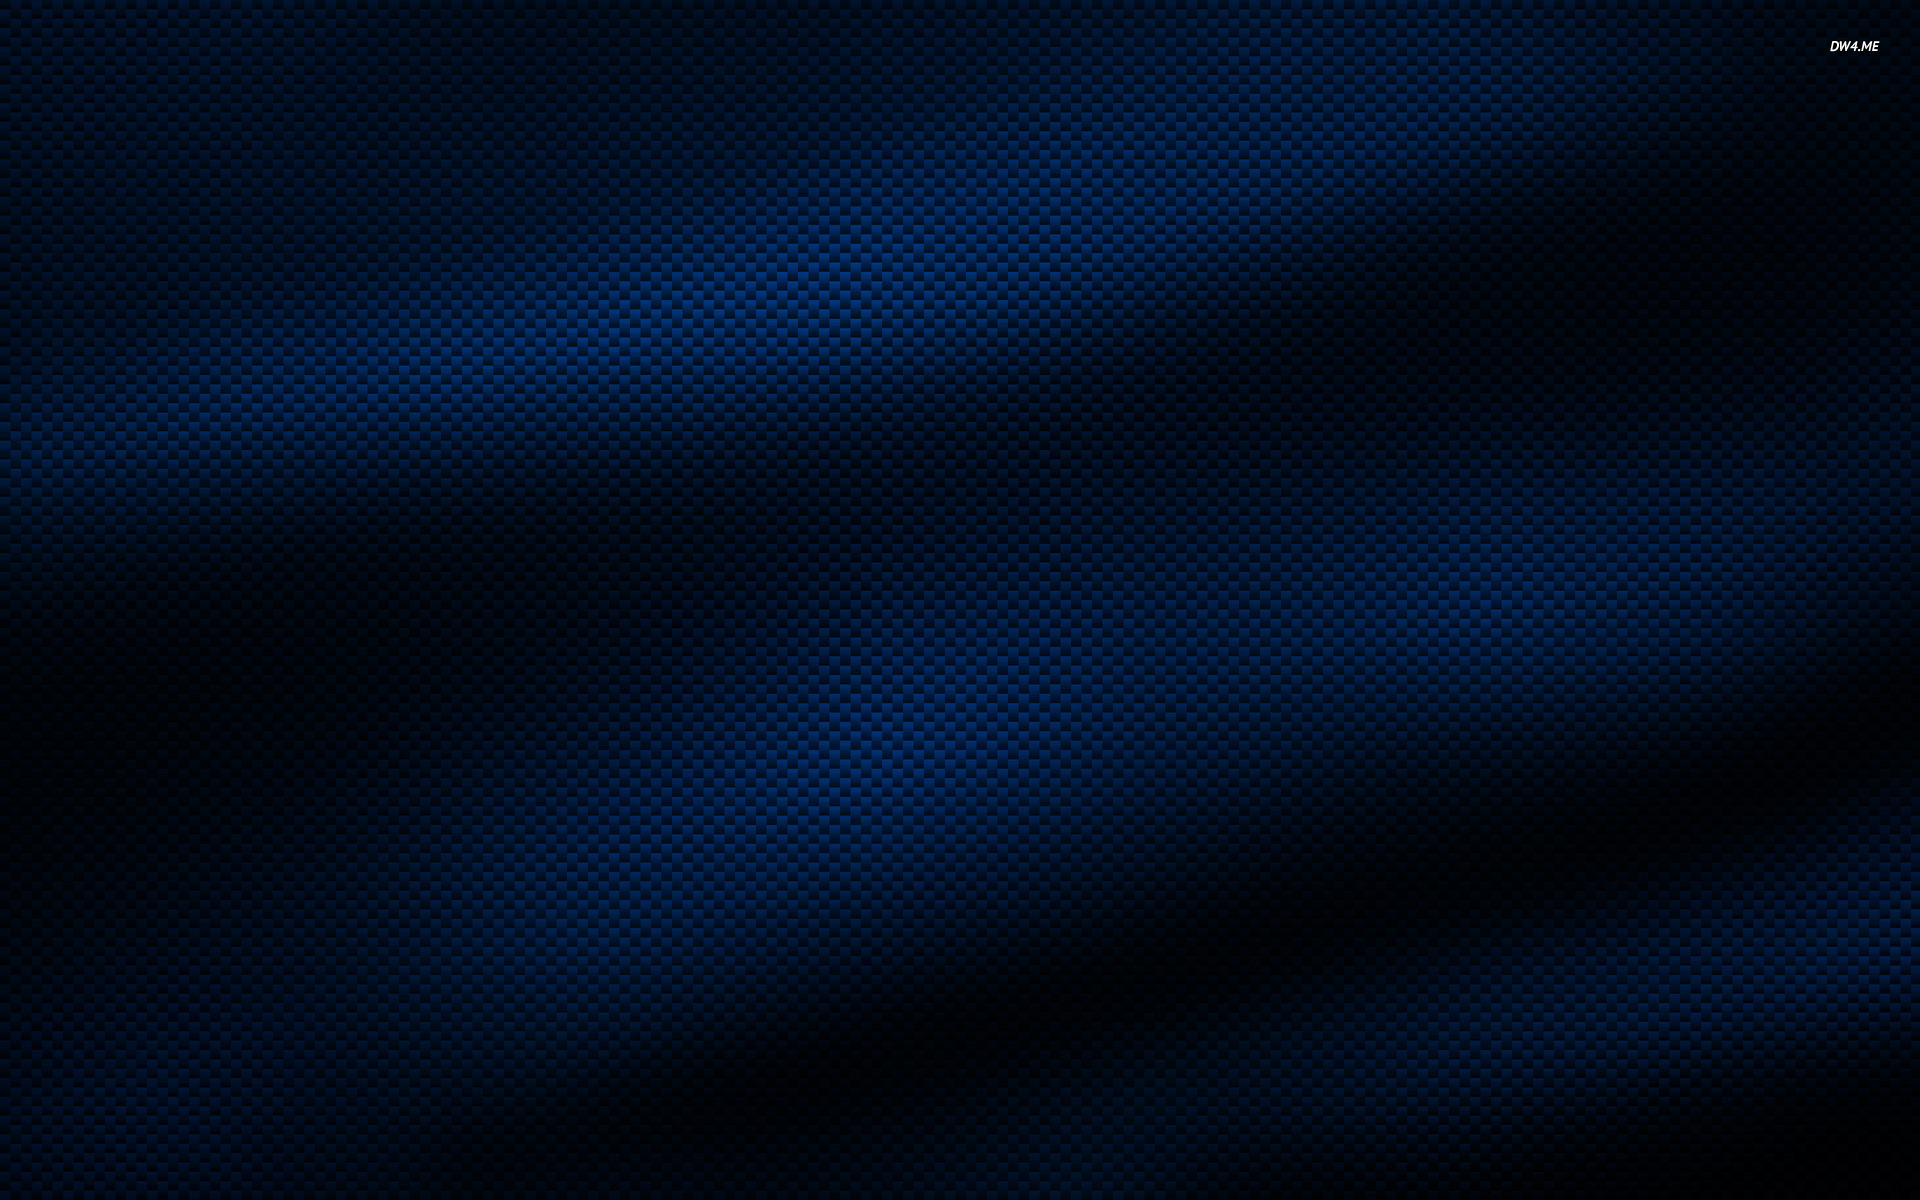 Carbon fiber fabric wallpaper   Abstract wallpapers   869 1920x1200